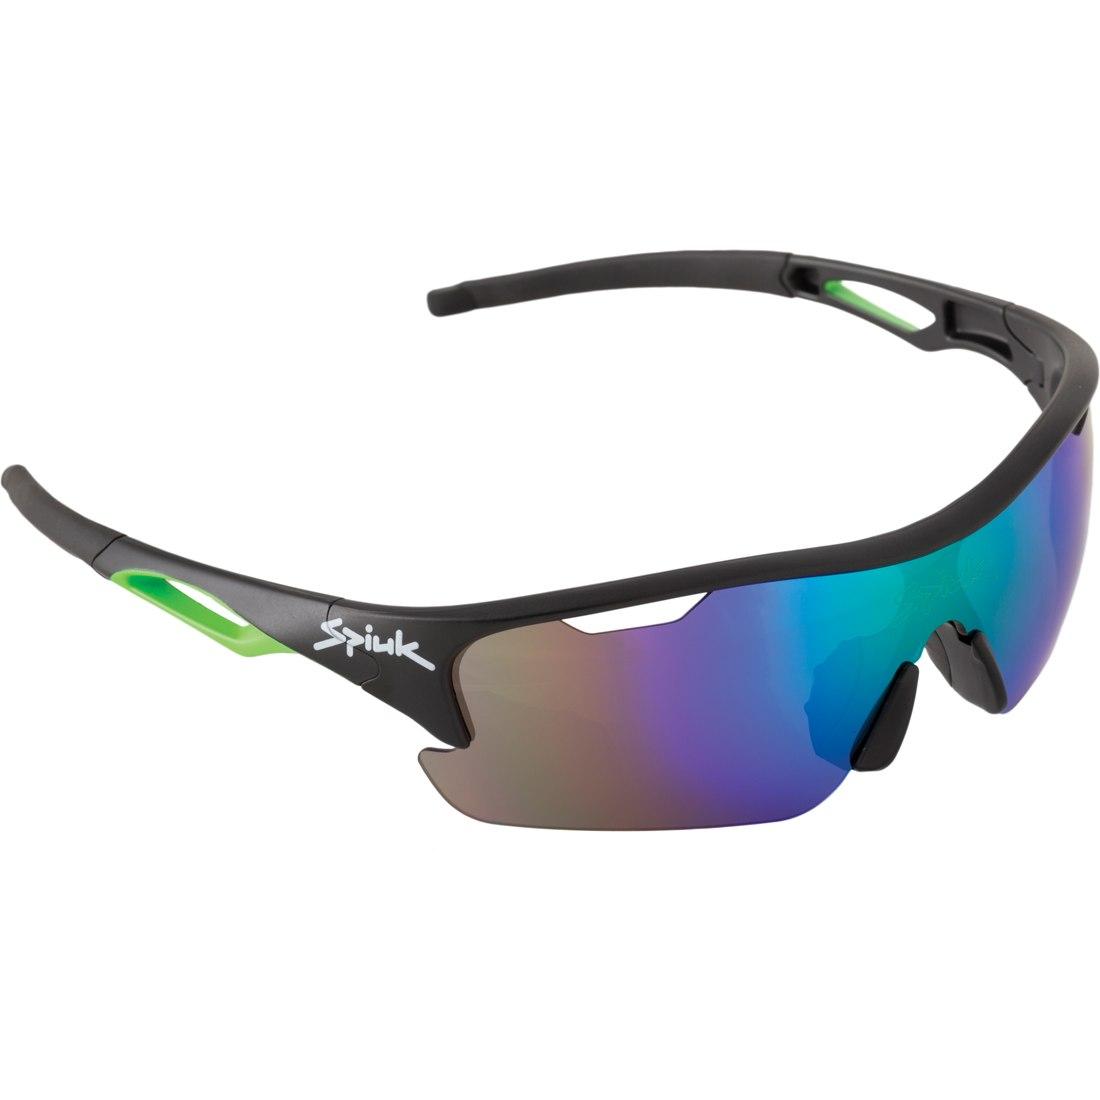 Spiuk Jifter Black/Green Mirror Green Brille